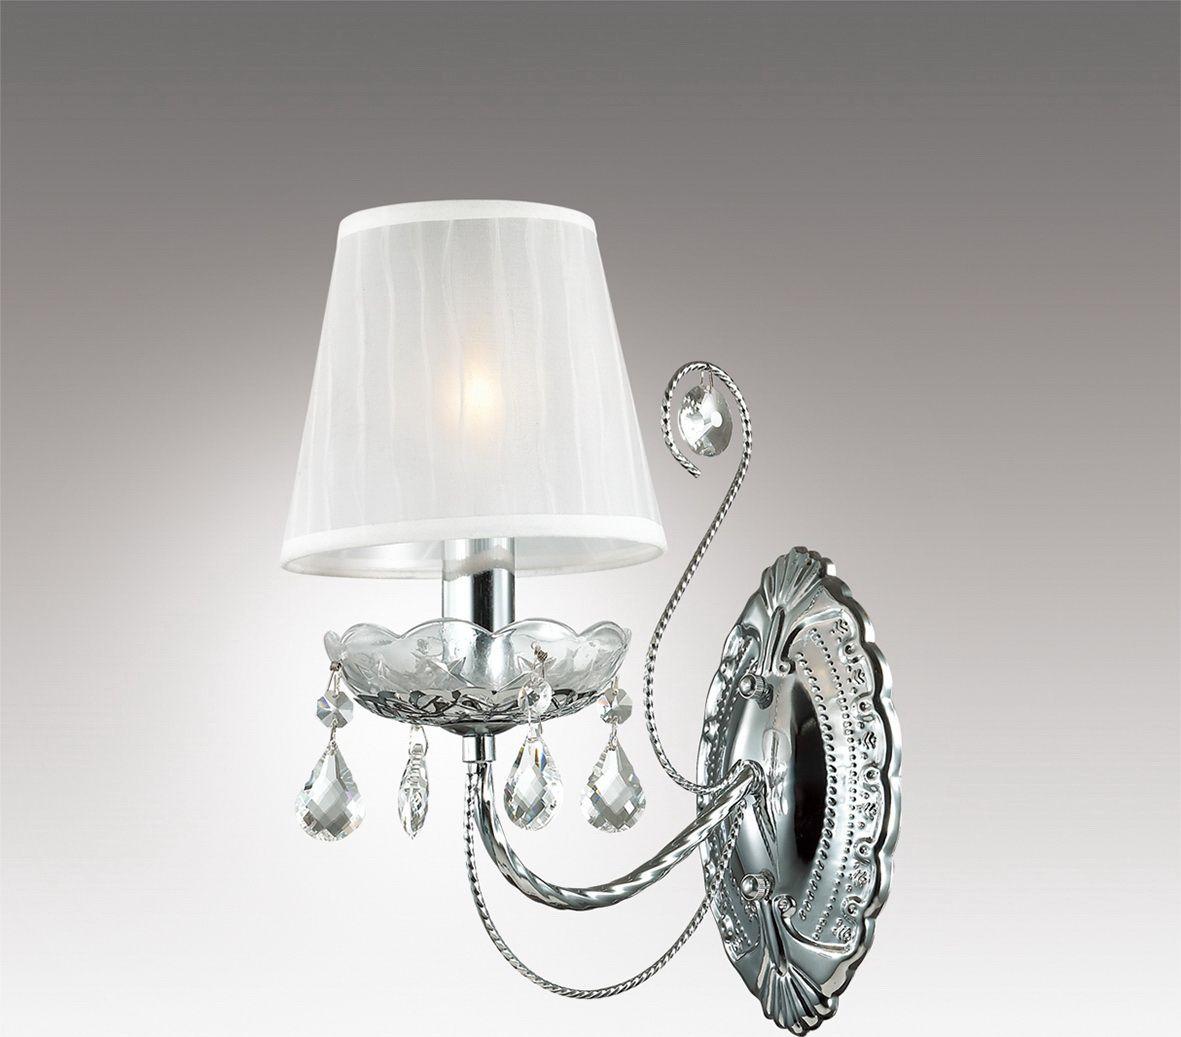 Бра Odeon Light Ofena, 1 х E14, 40W. 2927/1W2927/1W